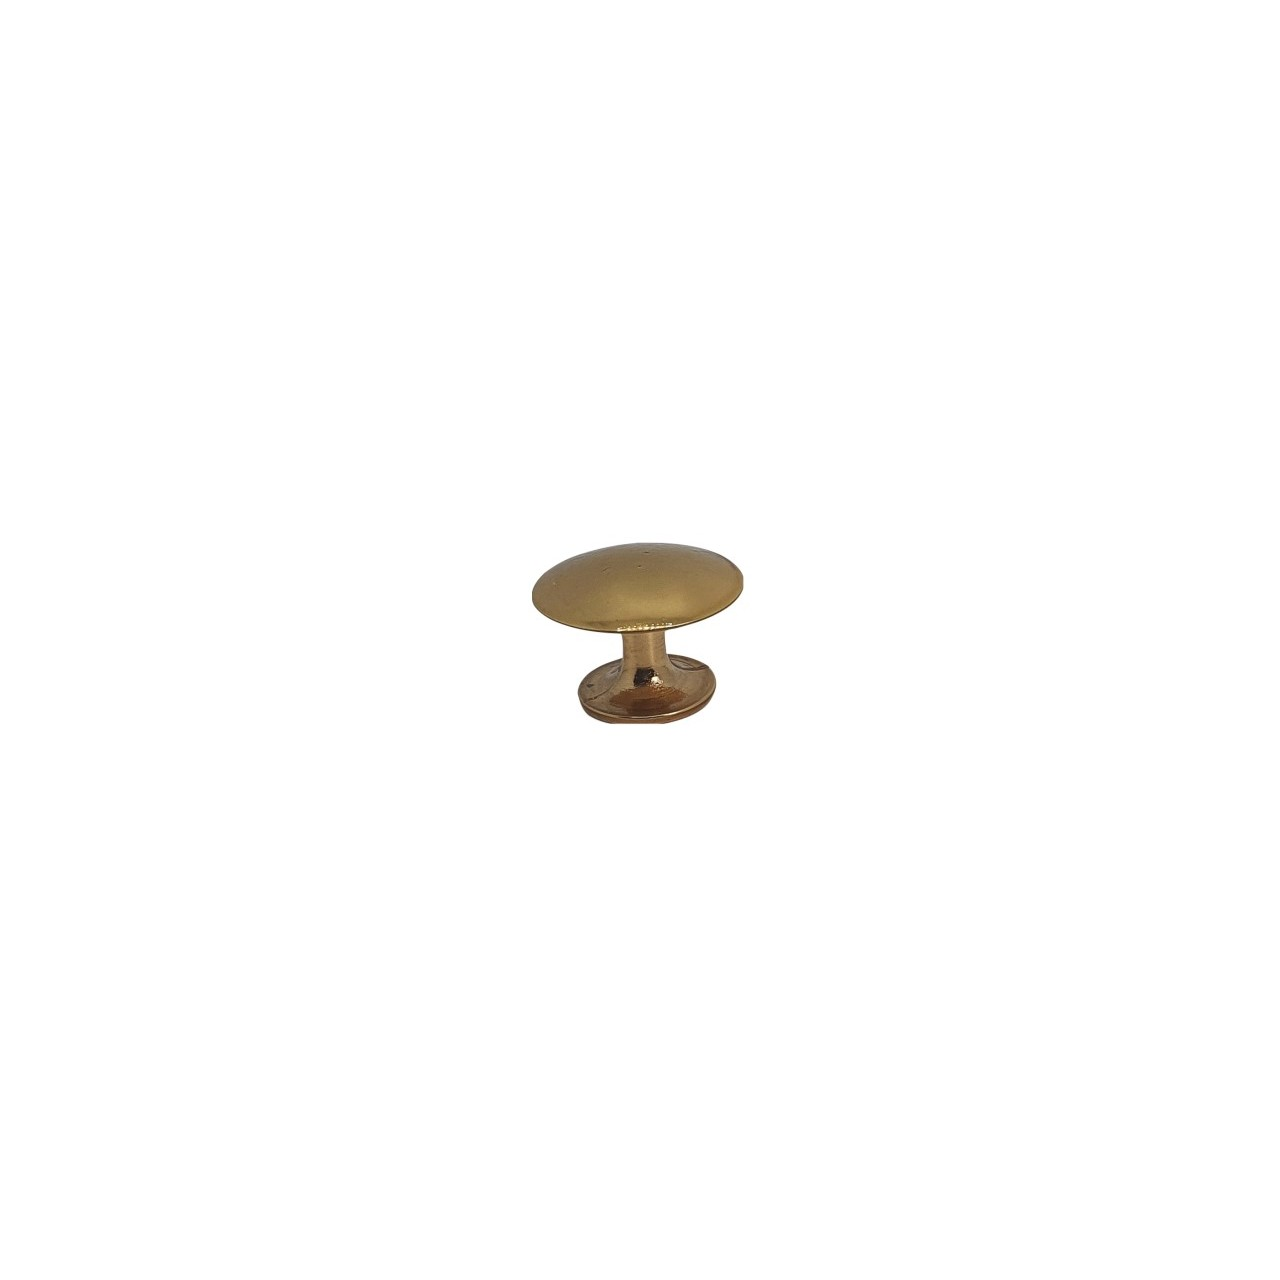 Puxador Kids Cogumelo 25mm Zamac Dourado - Hastvel